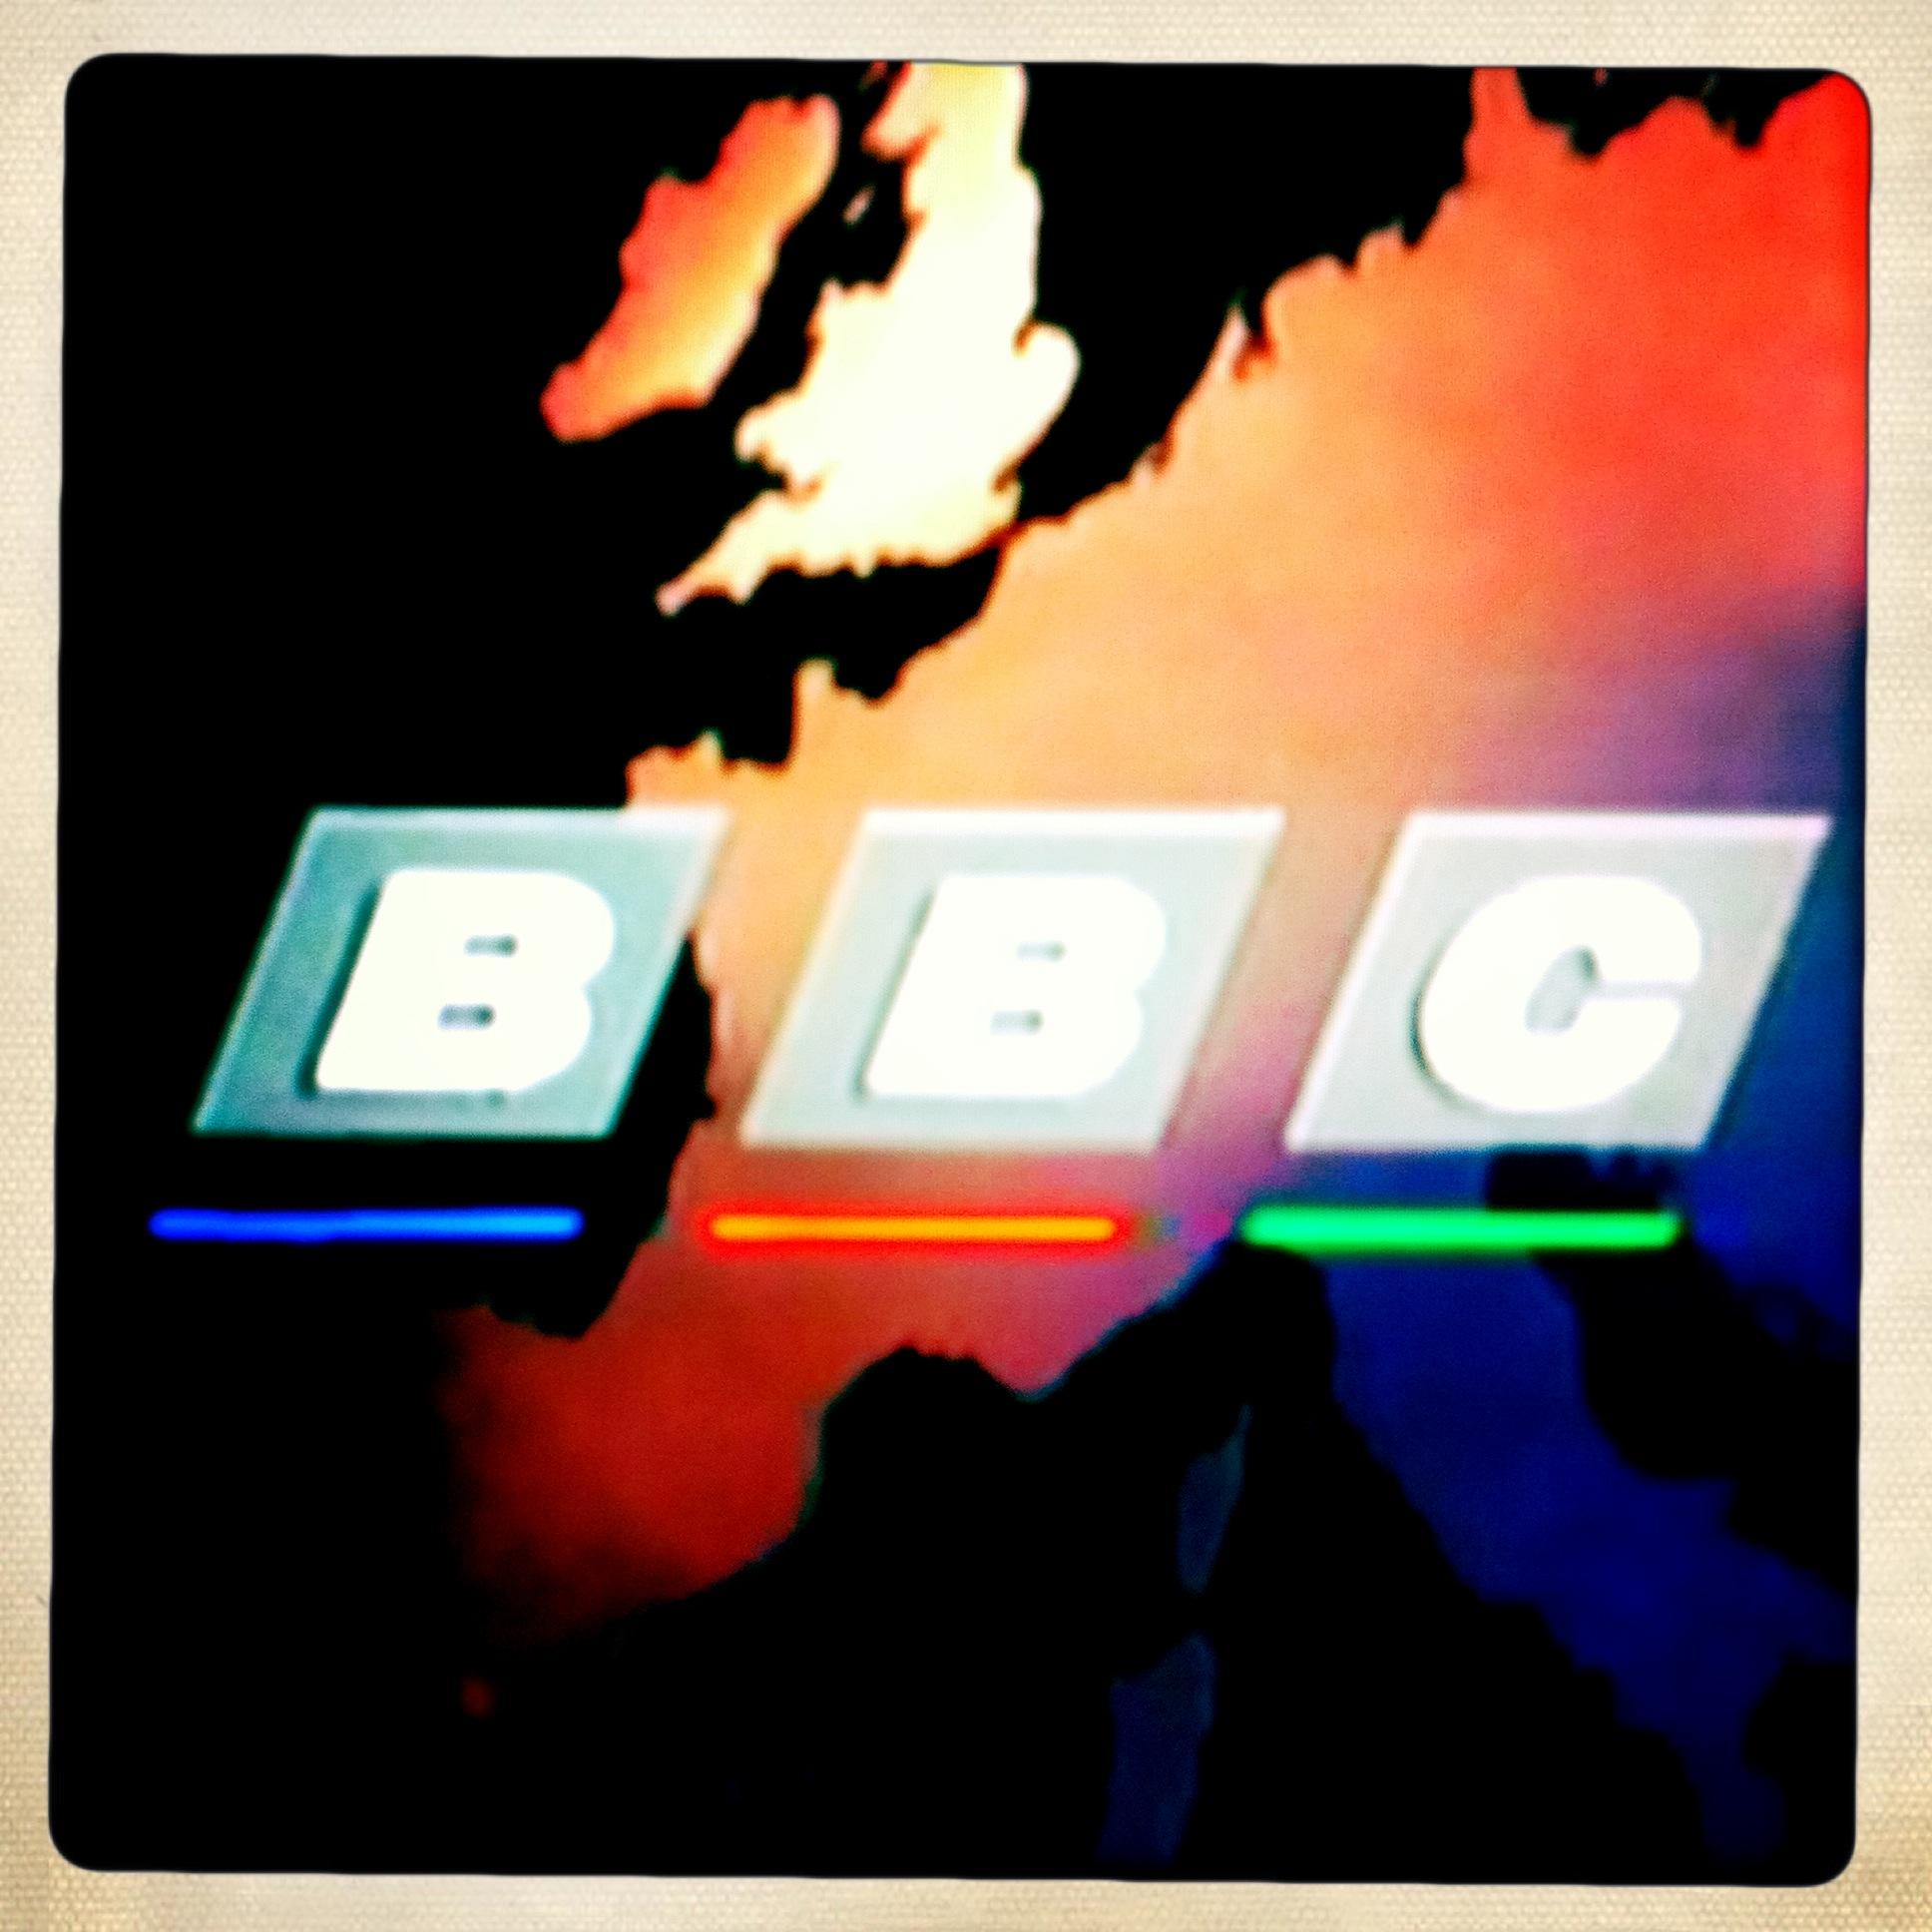 December 11 – BBC Radio 4 Woman's Hour Discuss Female Asperger's